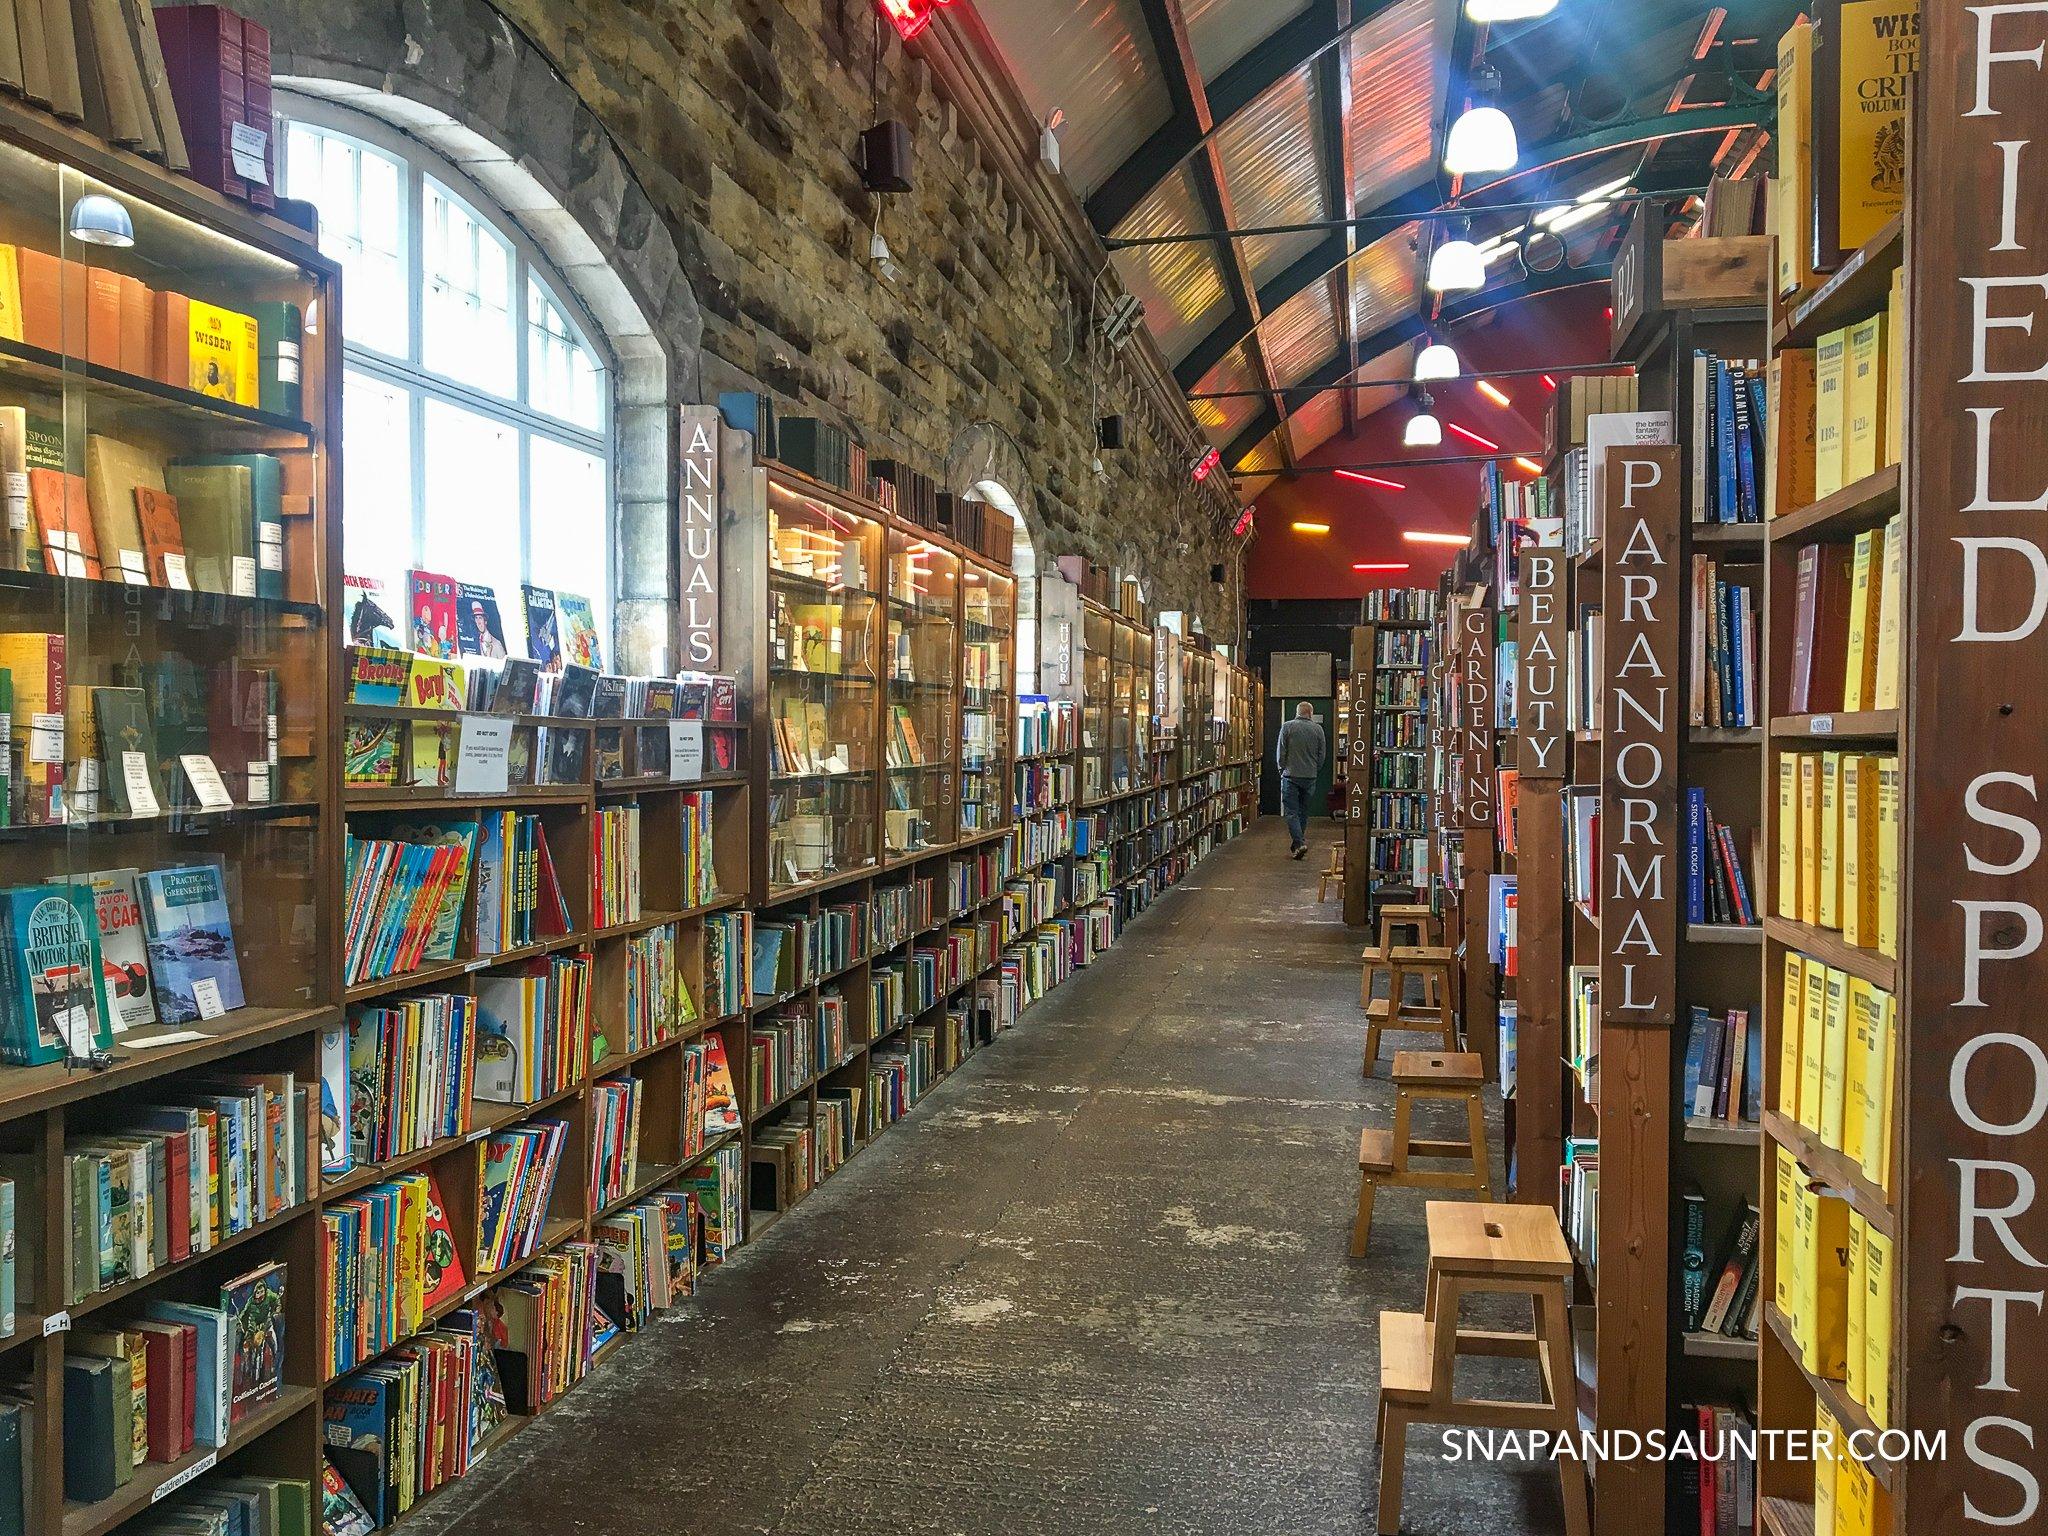 Barter Books bookshop library